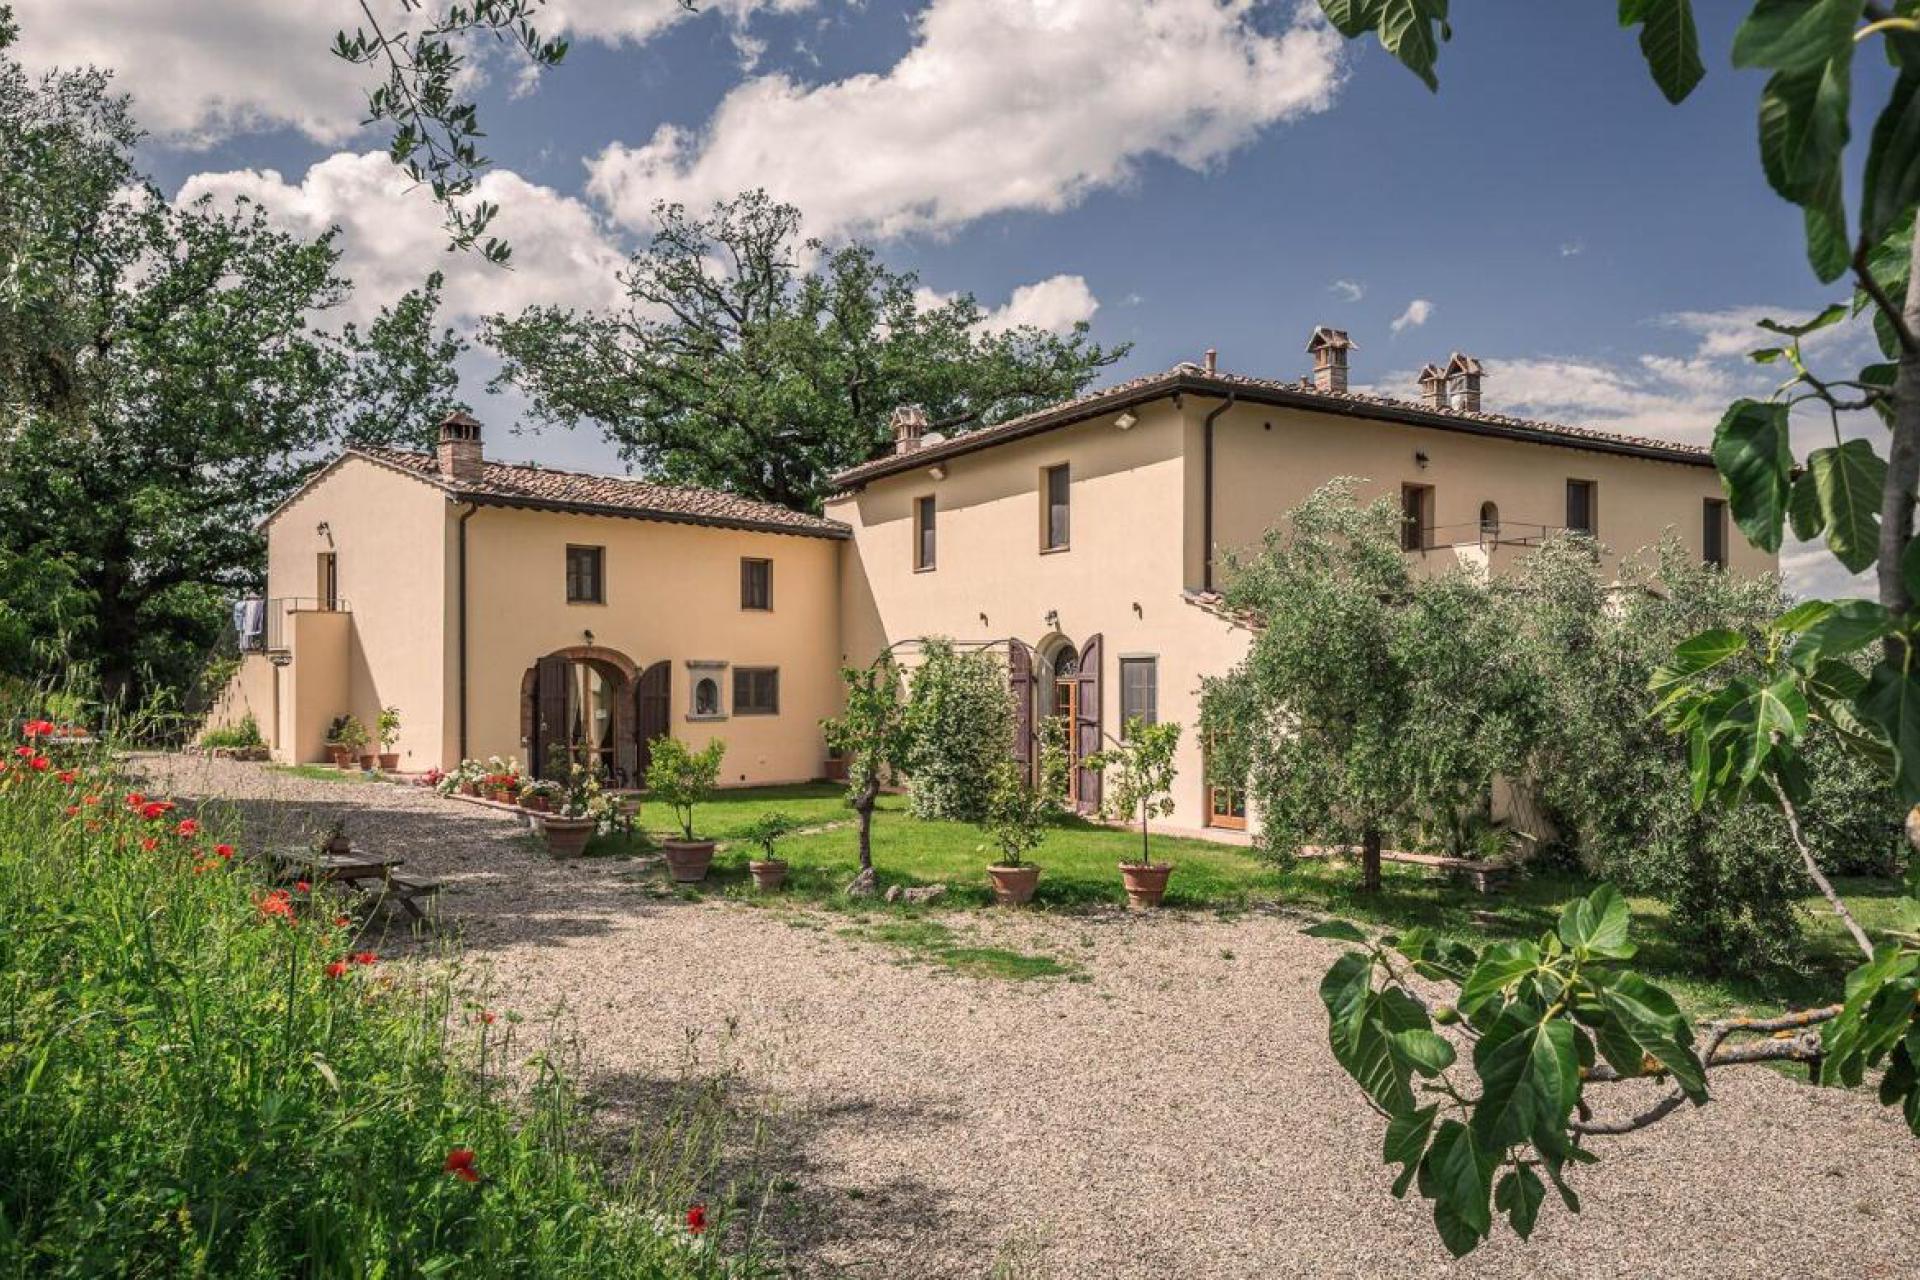 Agriturismo Toscane Rustige agriturismo in Toscane met prachtig uitzicht